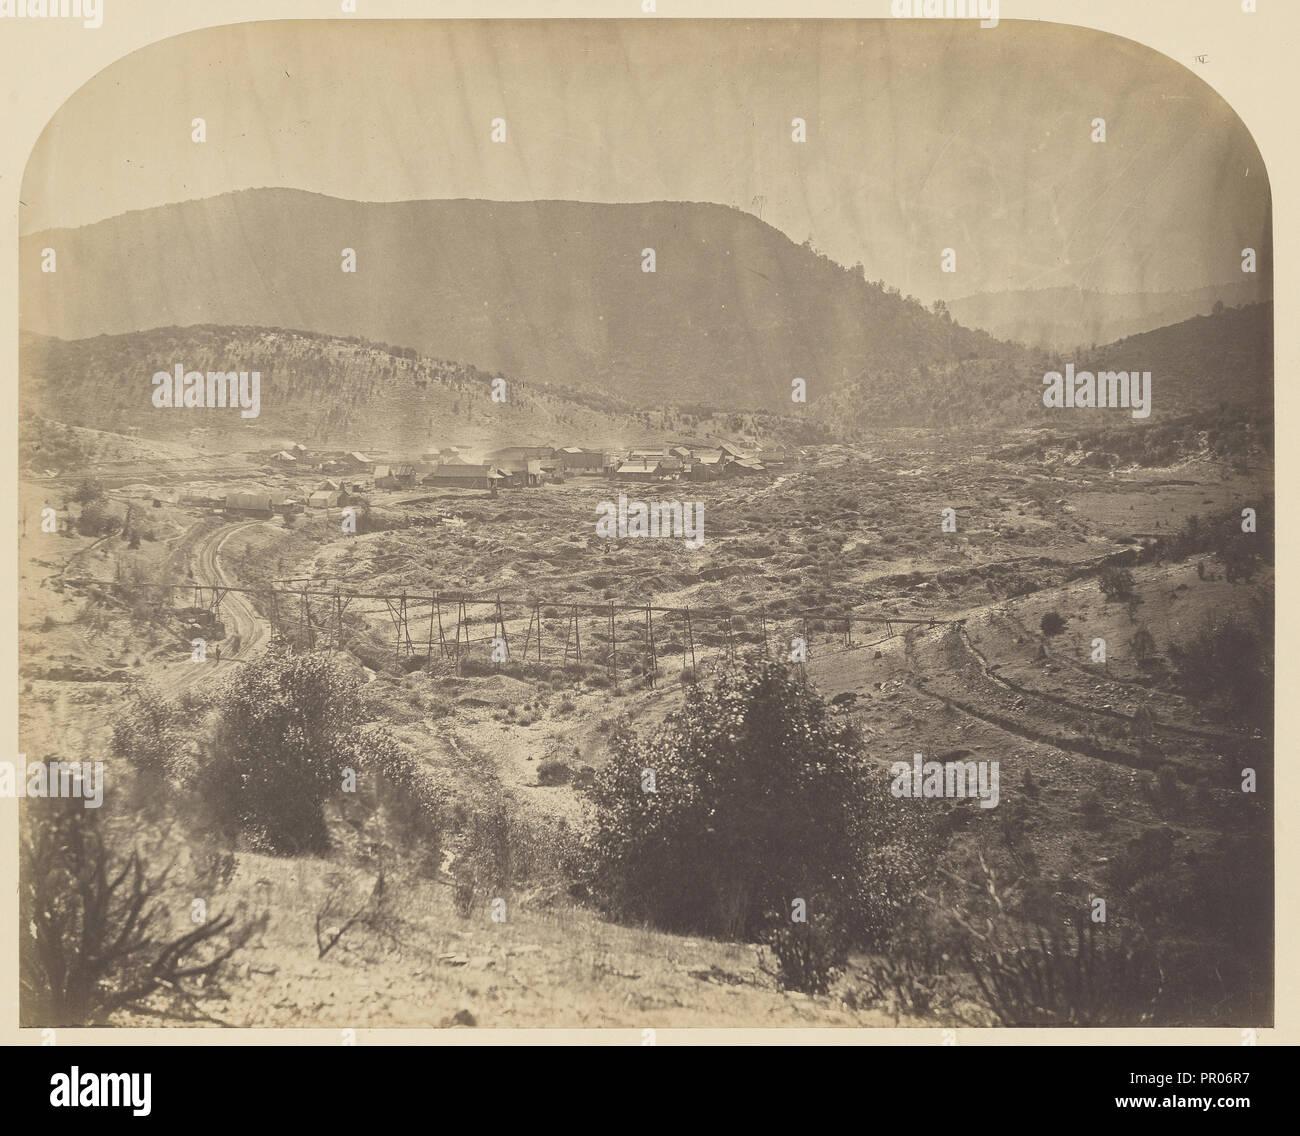 Lower Agua Fria; Carleton Watkins, American, 1829 - 1916, 1860; Salted paper print; 33.7 x 41.9 cm 13 1,4 x 16 1,2 in - Stock Image